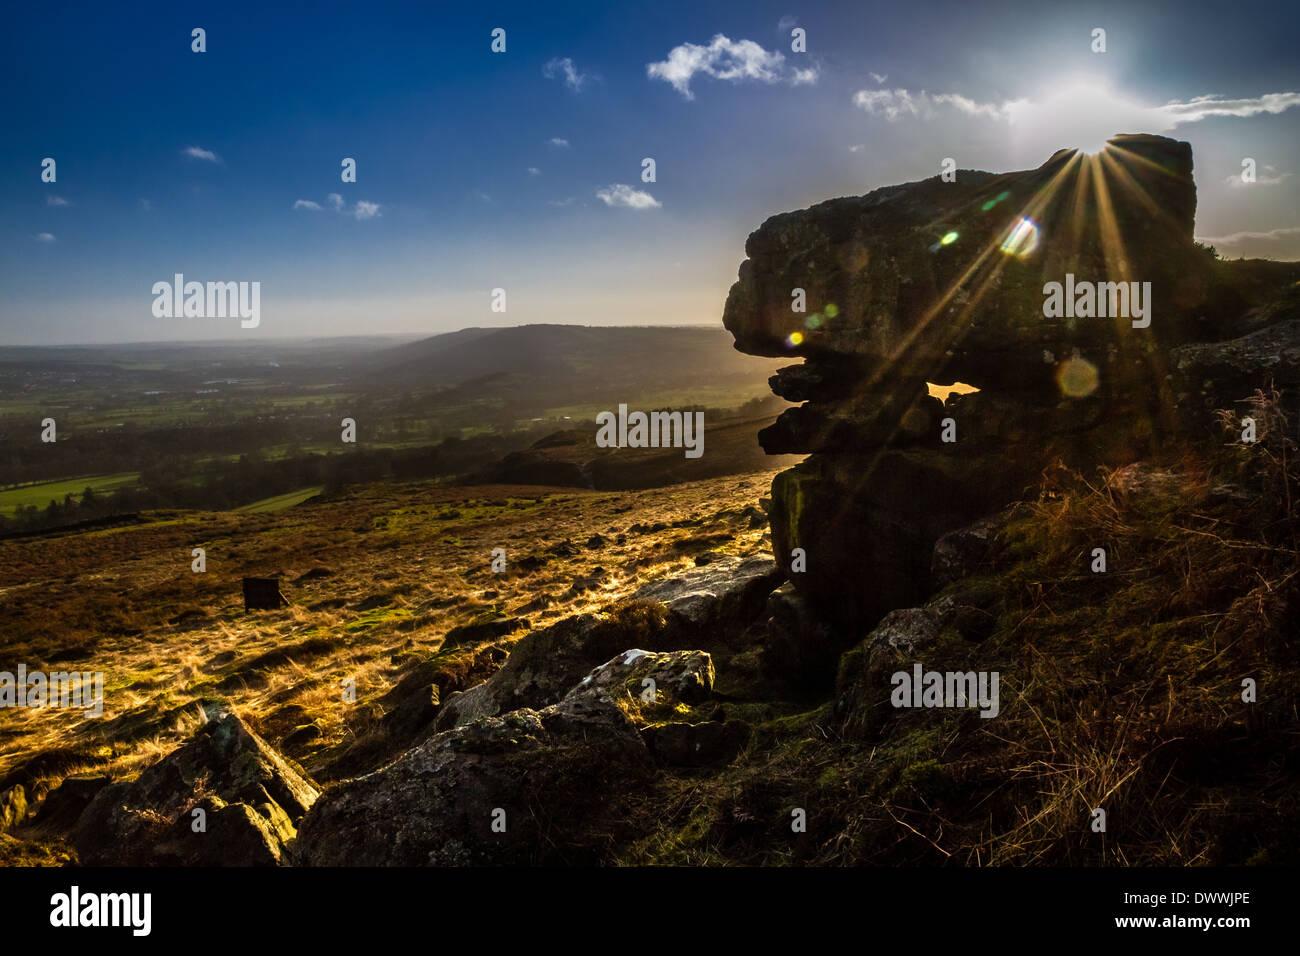 Rural Yorkshire: Sunburst over rocks on the beautiful Ilkley Moor, UK - Stock Image